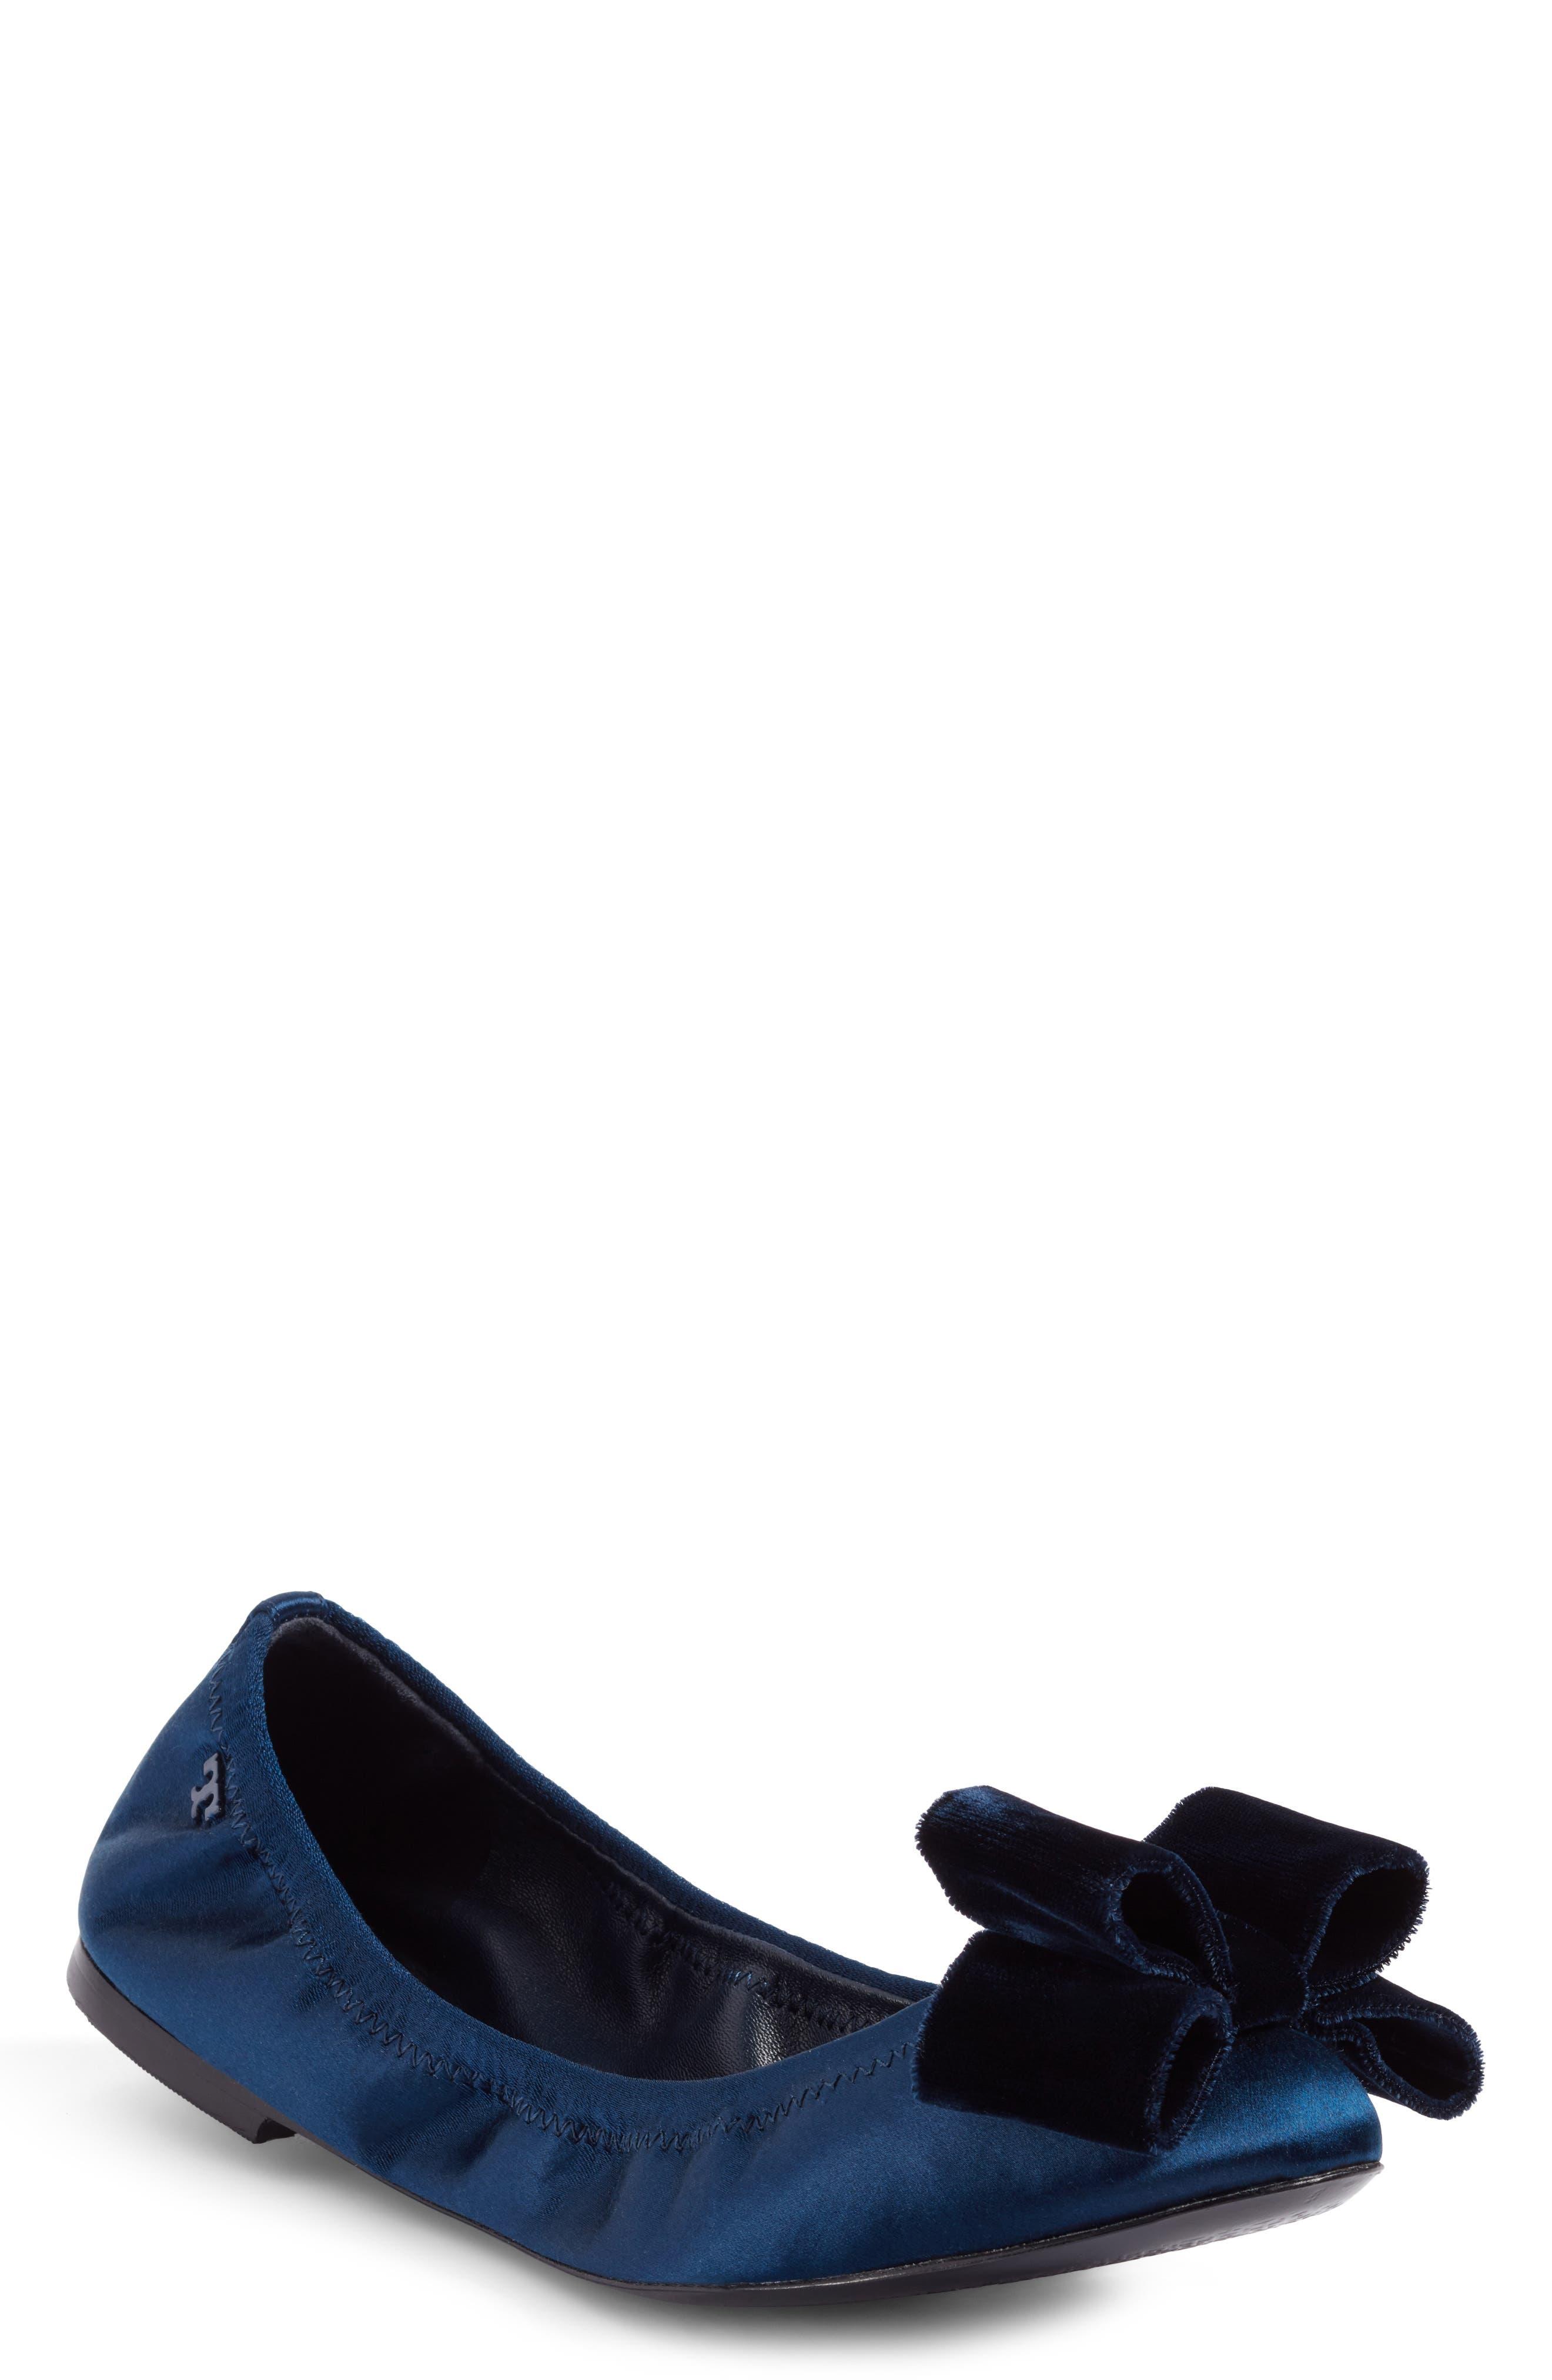 Tory Burch Viola Bow Ballet Flat (Women)